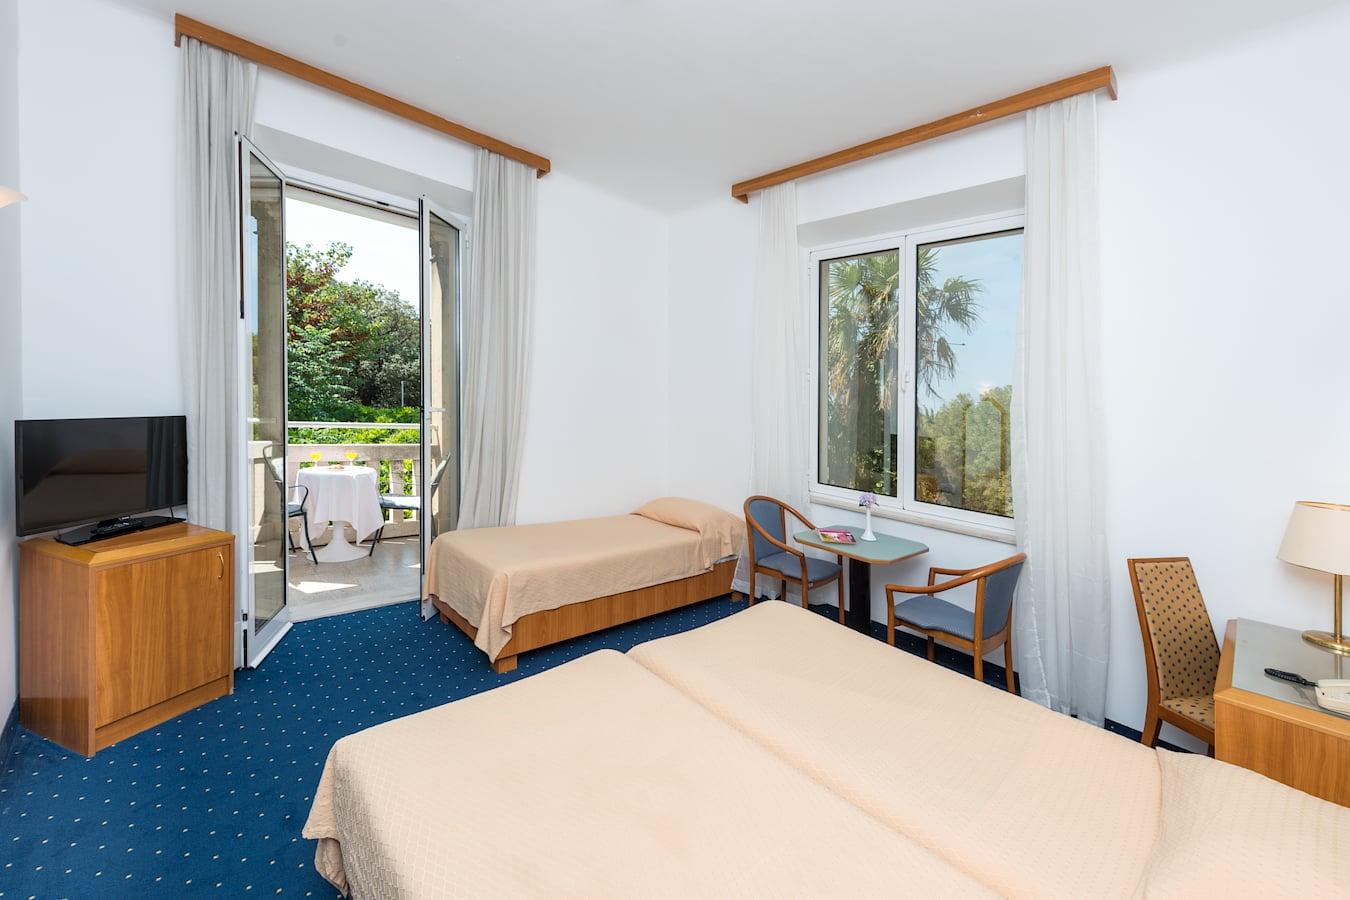 komodor-hotel-tripple-room-balcony-parkview.jpg